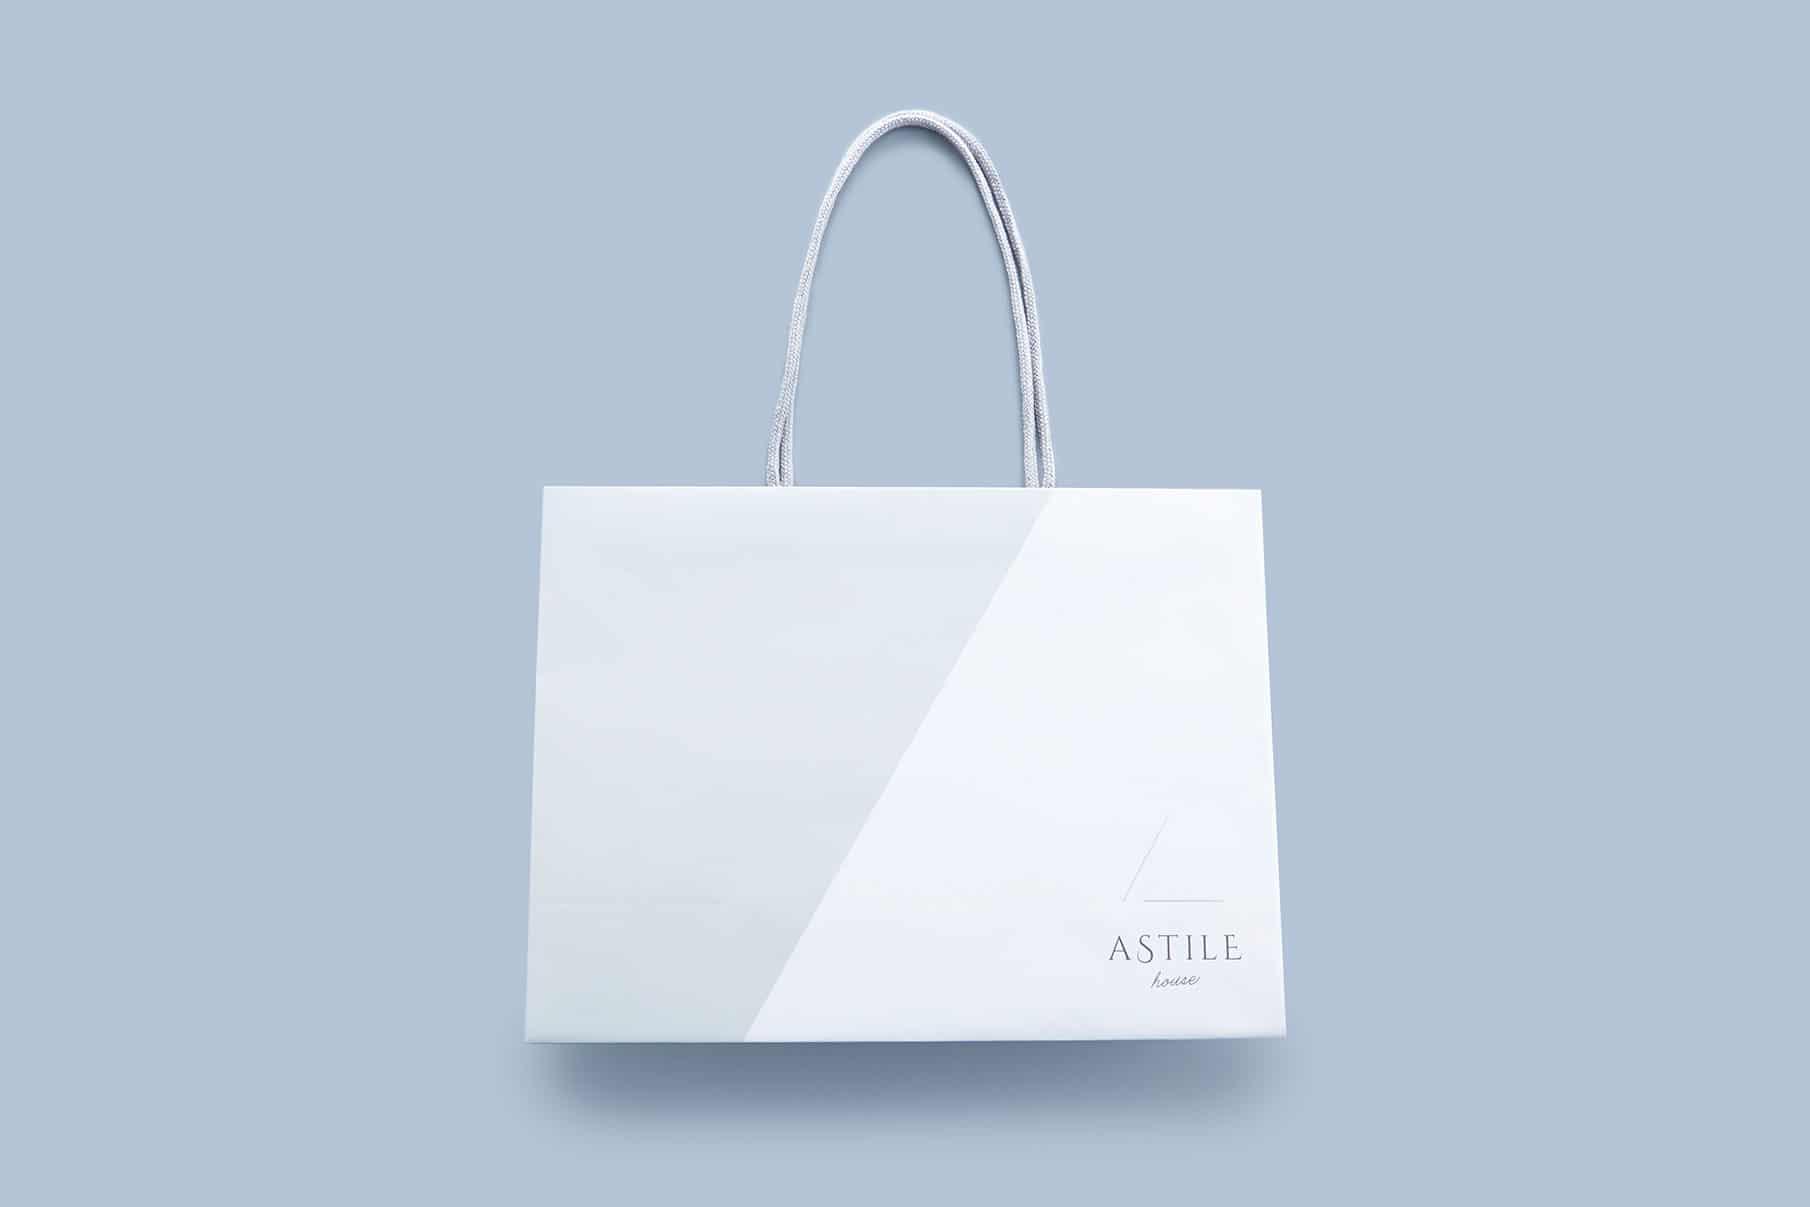 ASTILE house - Shop Tools 5